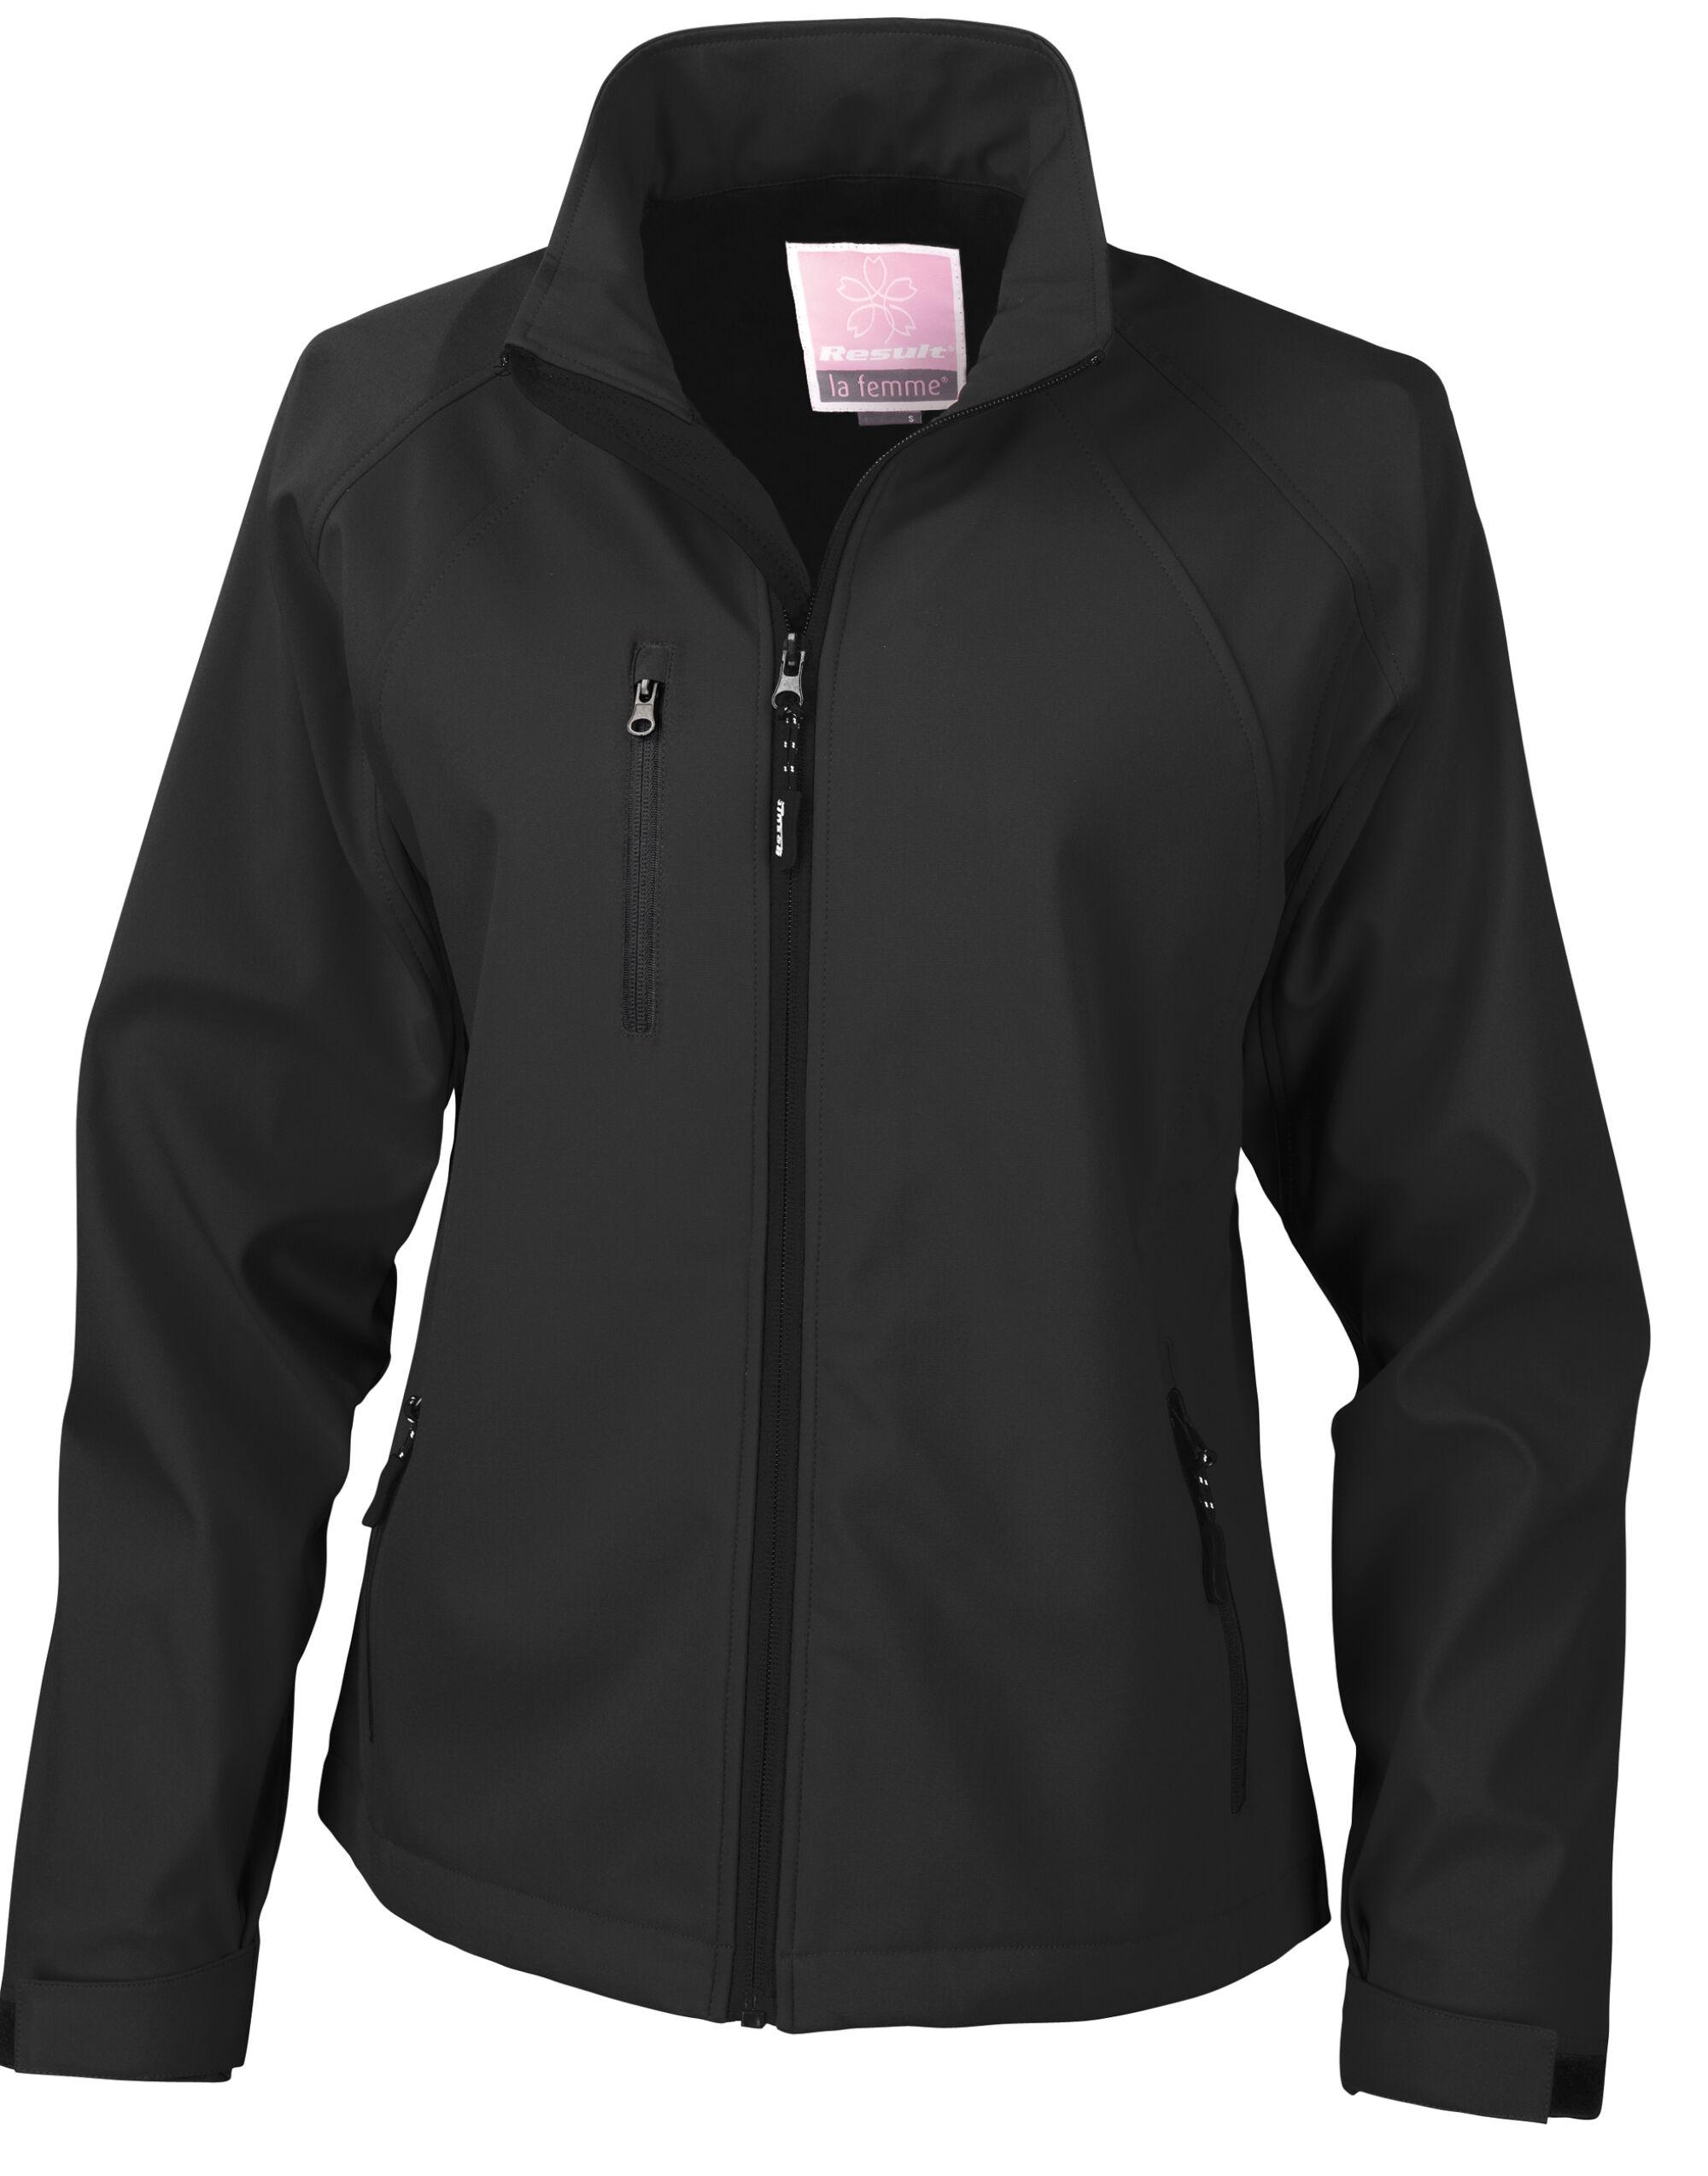 La Femma 2 Layer Base Softshell Jacket